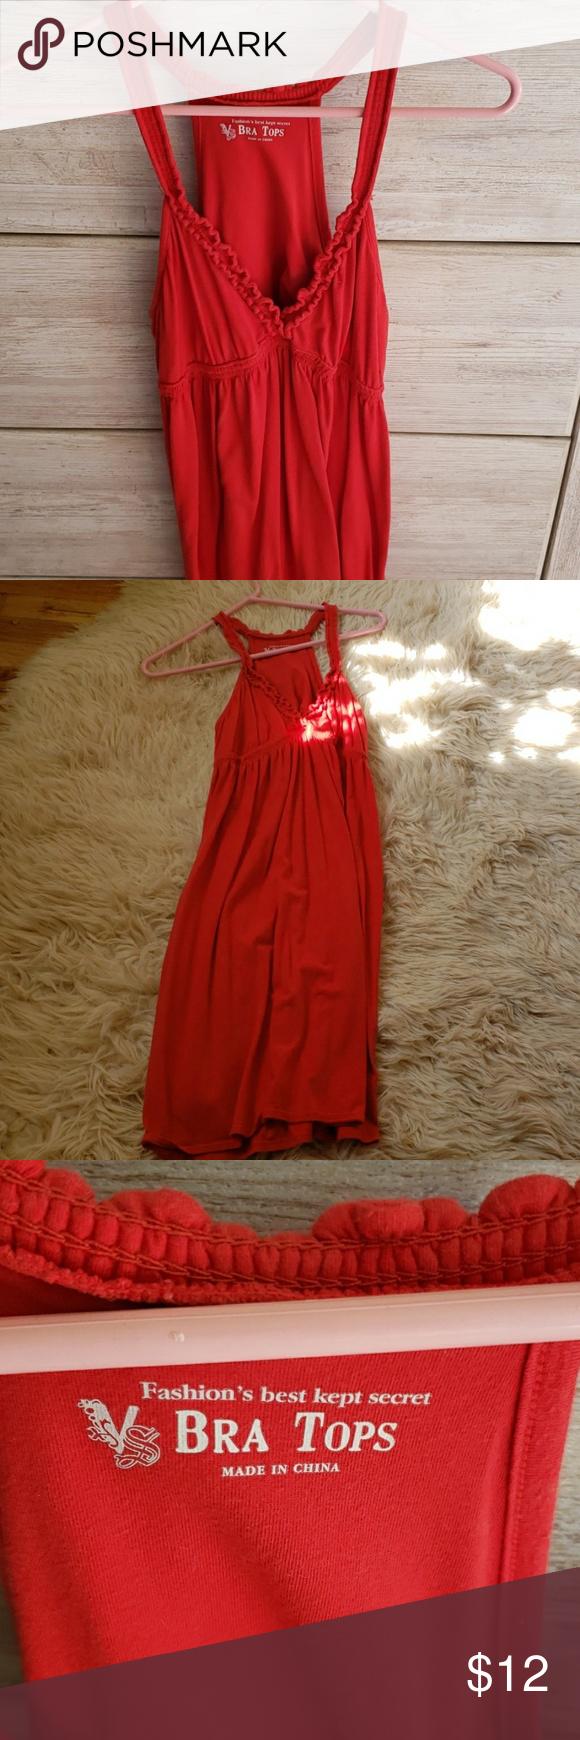 Victoria S Secret Mini Dress With Built In Bra Victoria Secret Mini Dress Cute Summer Dresses [ 1740 x 580 Pixel ]